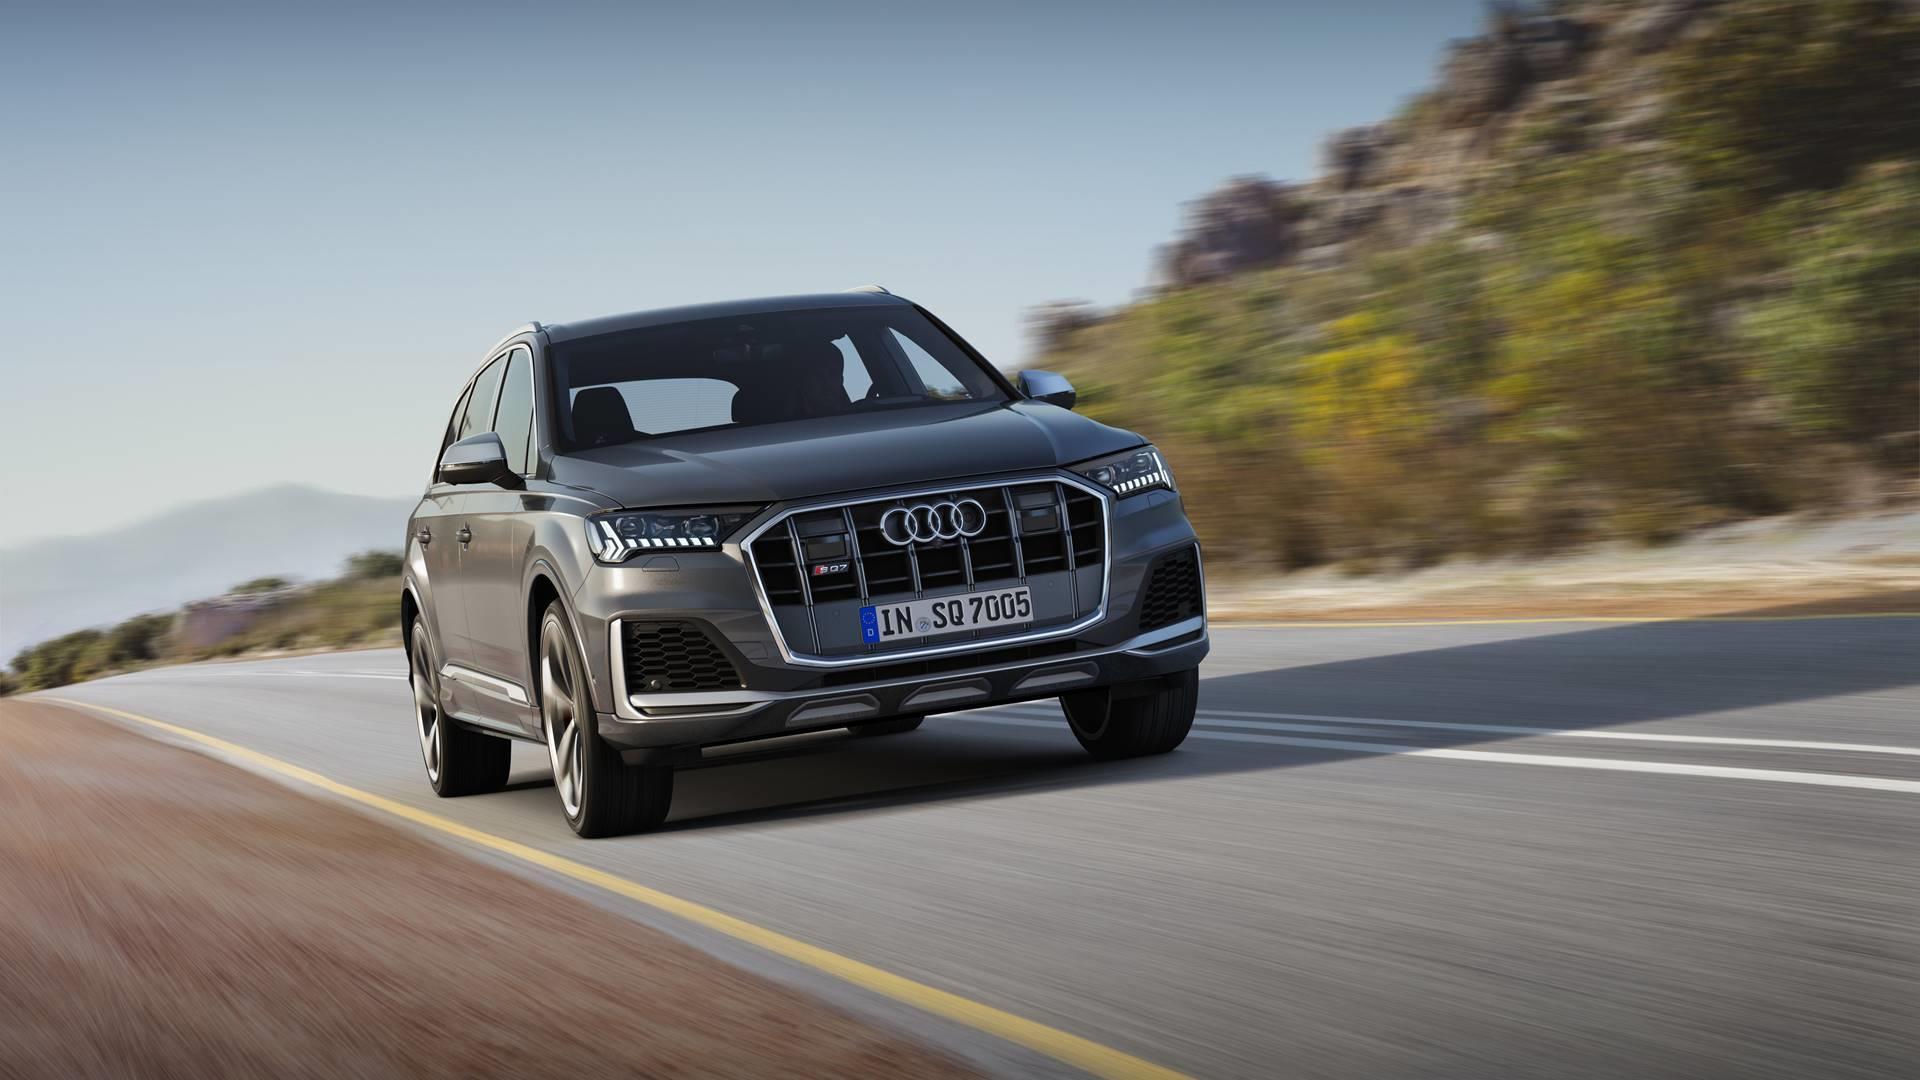 2020 Audi Sq7 Tdi News And Information Conceptcarz Com